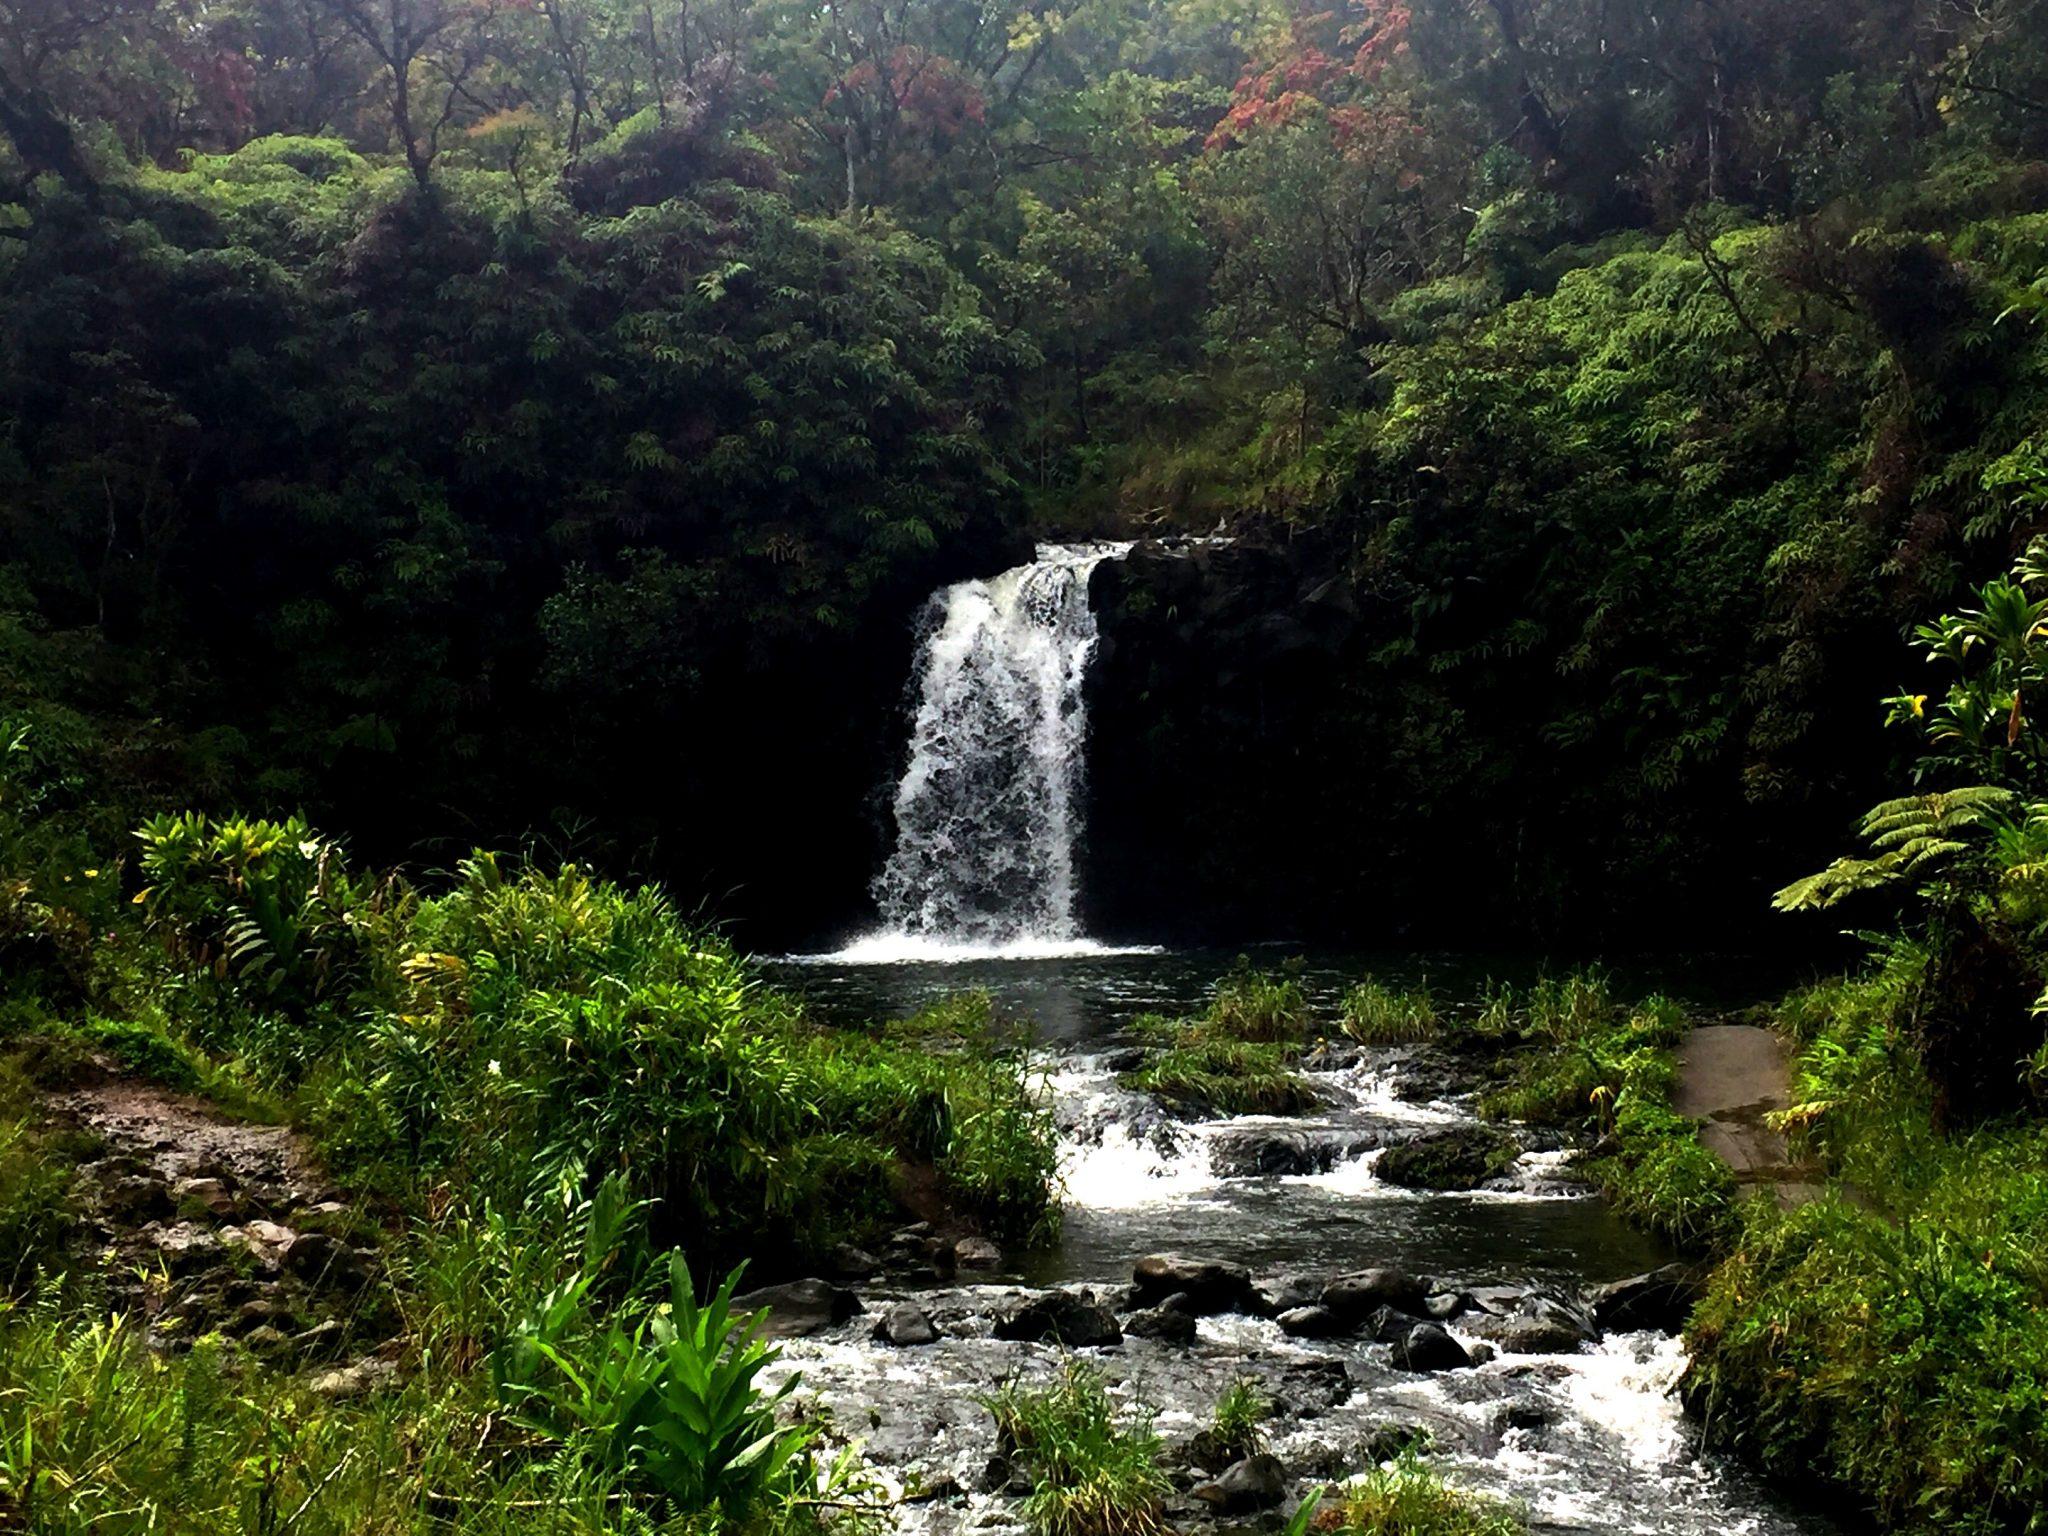 Road to Hana Stops | Waterfalls